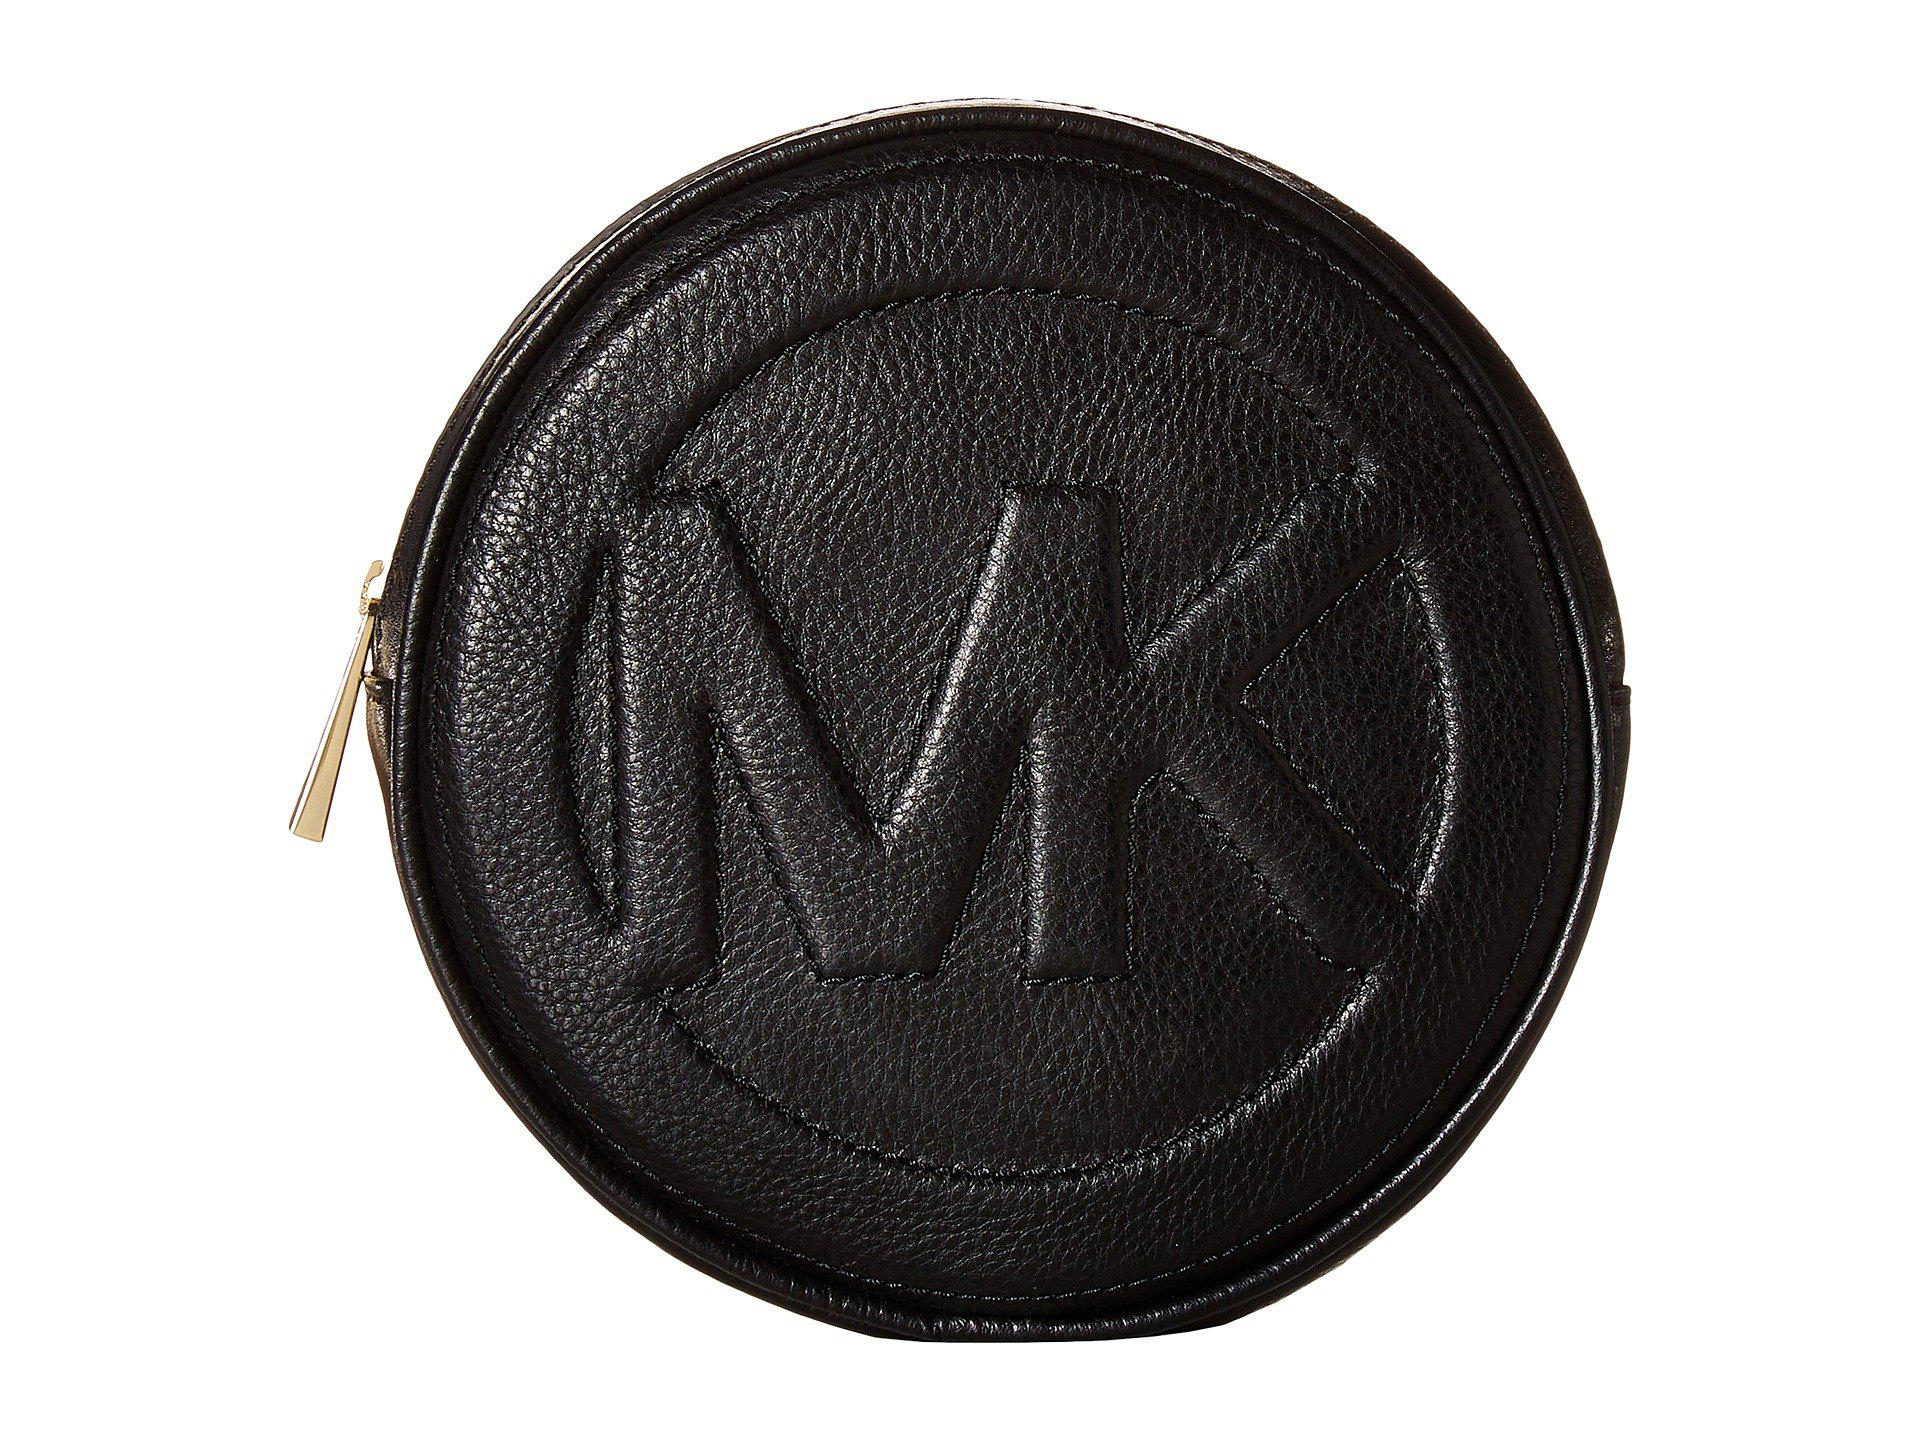 a56f946ff036 ... spain lyst michael michael kors round bombe logo belt bag in black  e8456 7cb27